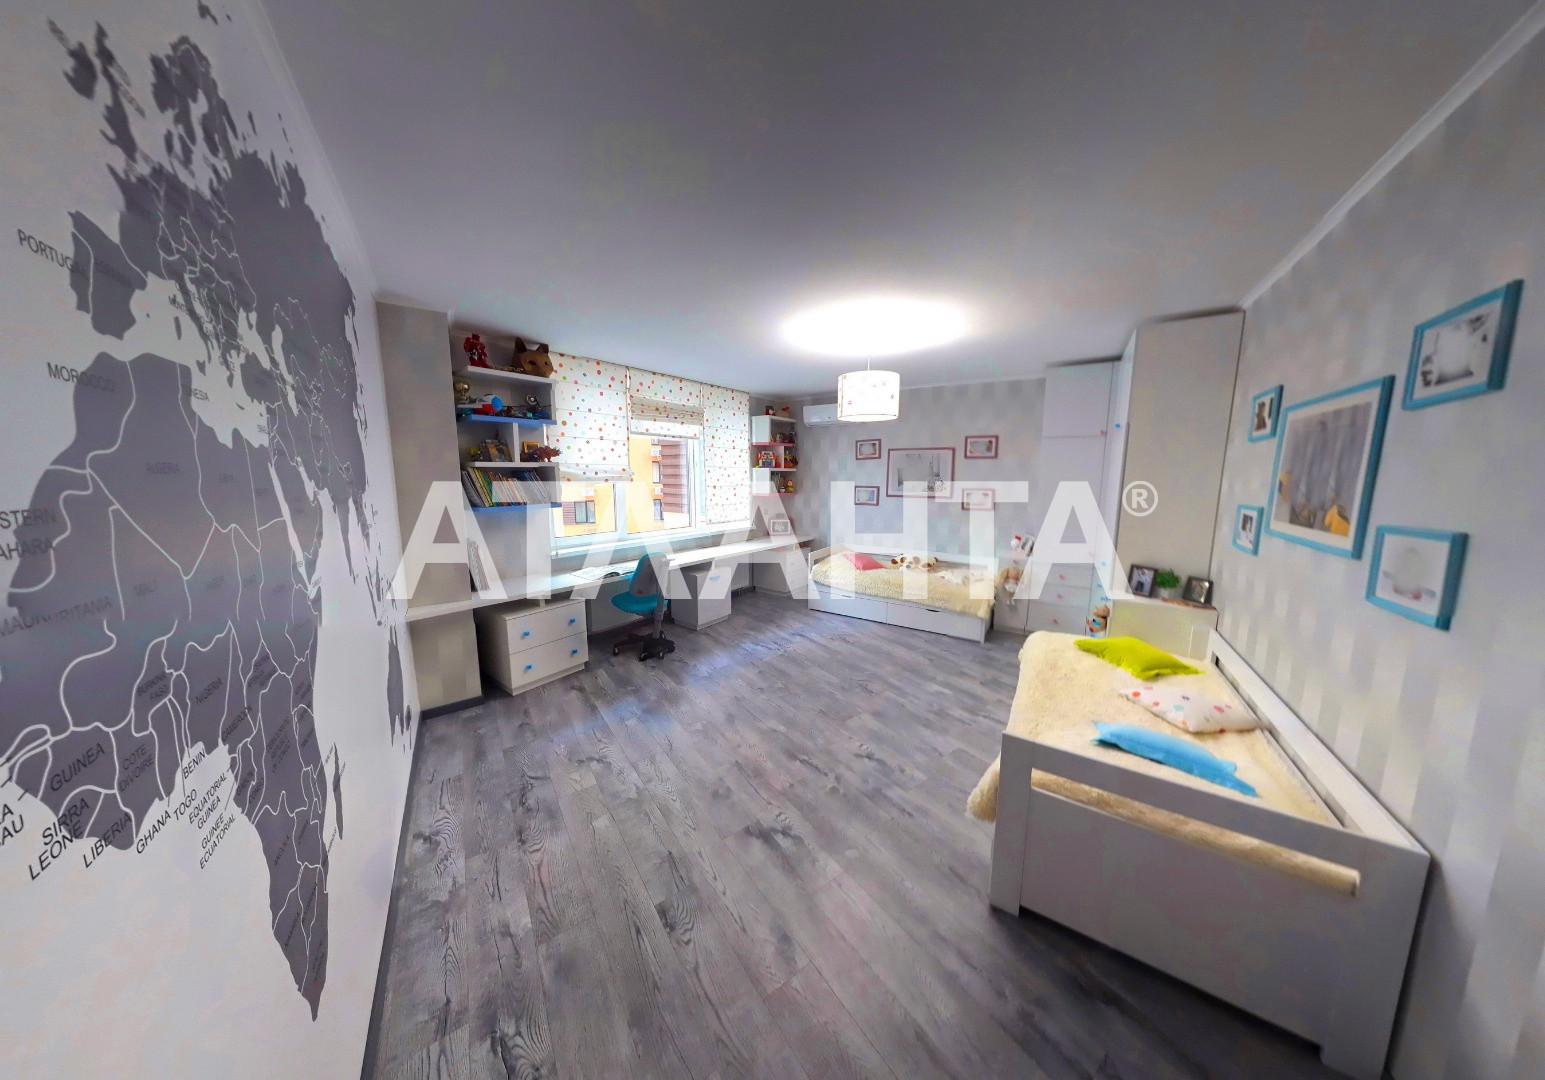 Продается 3-комнатная Квартира на ул. Ул. Ломоносова  — 220 000 у.е. (фото №8)